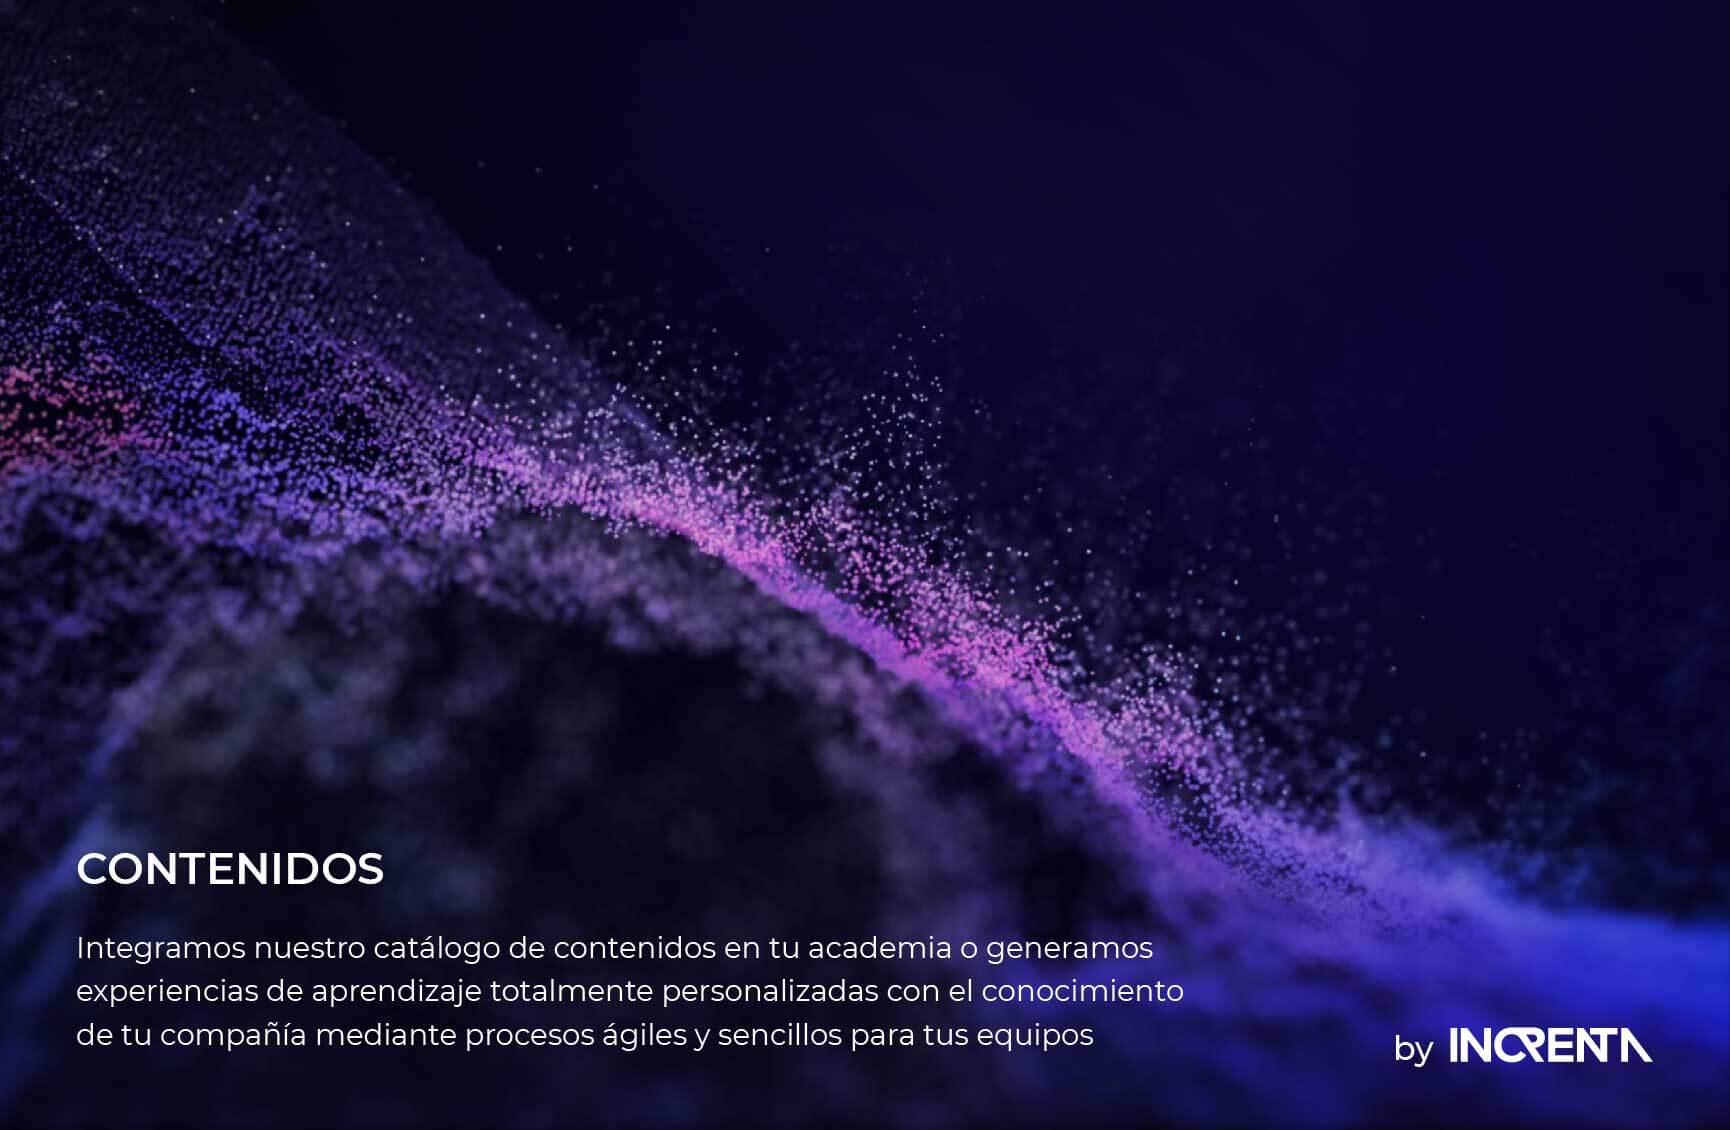 Soluciones Increnta_Corporate academy 3